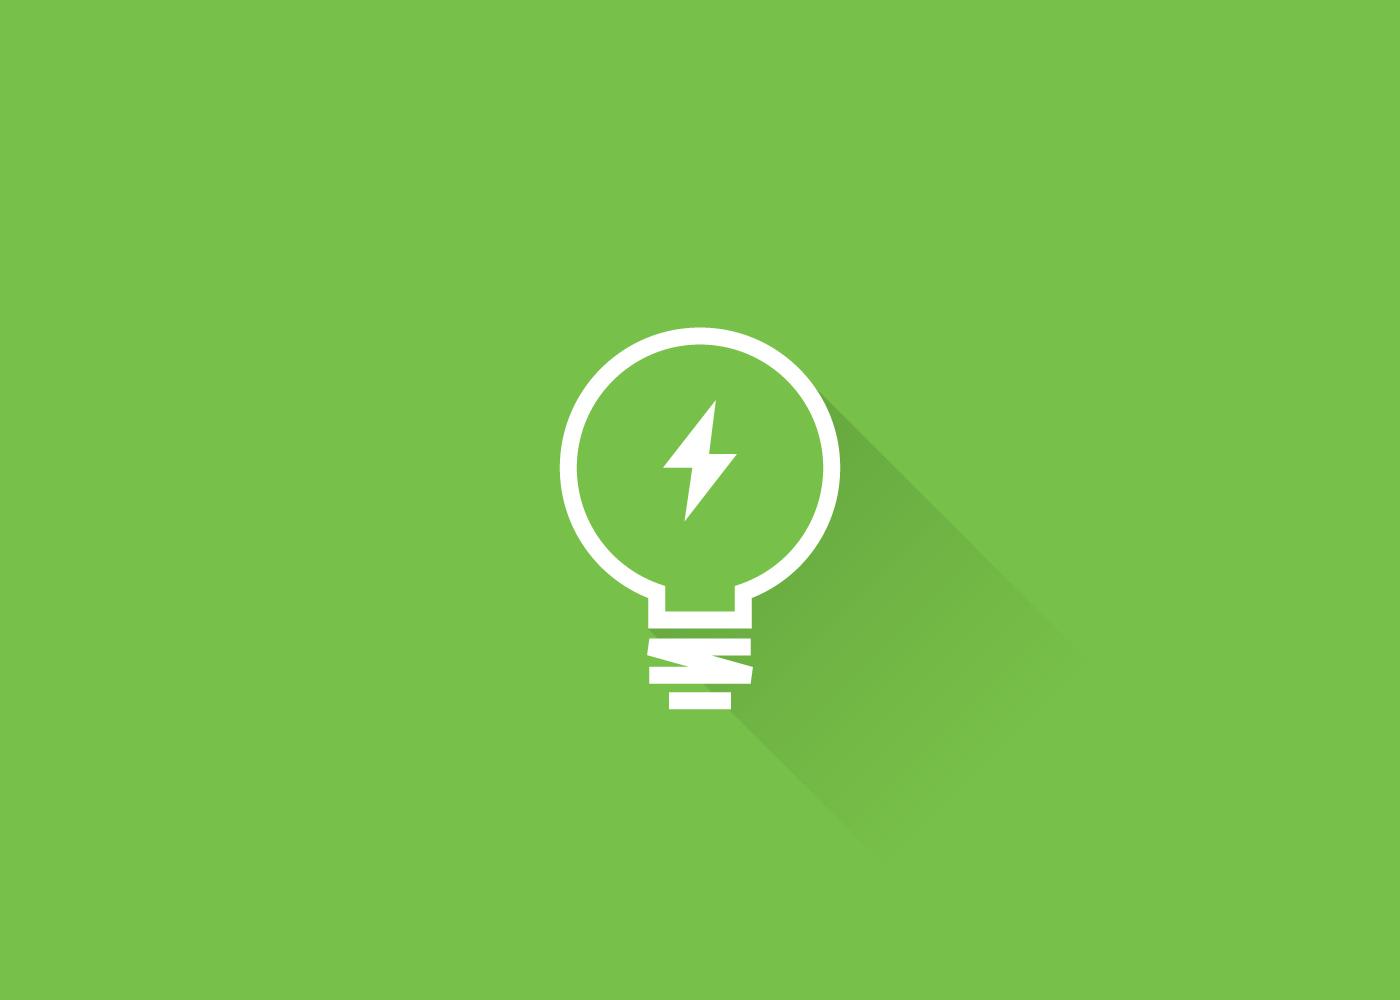 naem-research-quickpolls-2017-03-energy-intensity-index-metrics-700x500